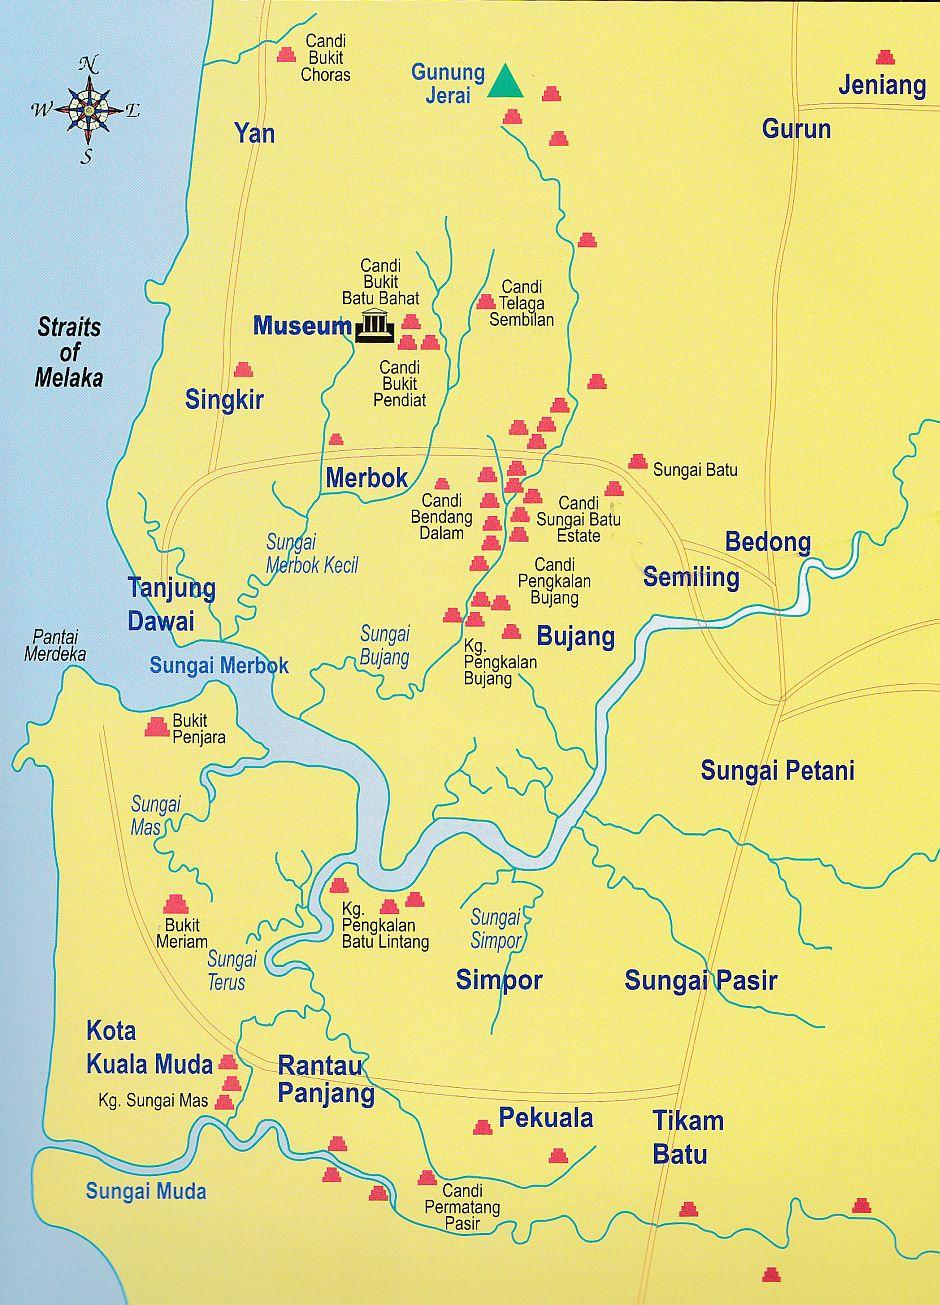 A map of archaeological sites near Lembah Bujang.